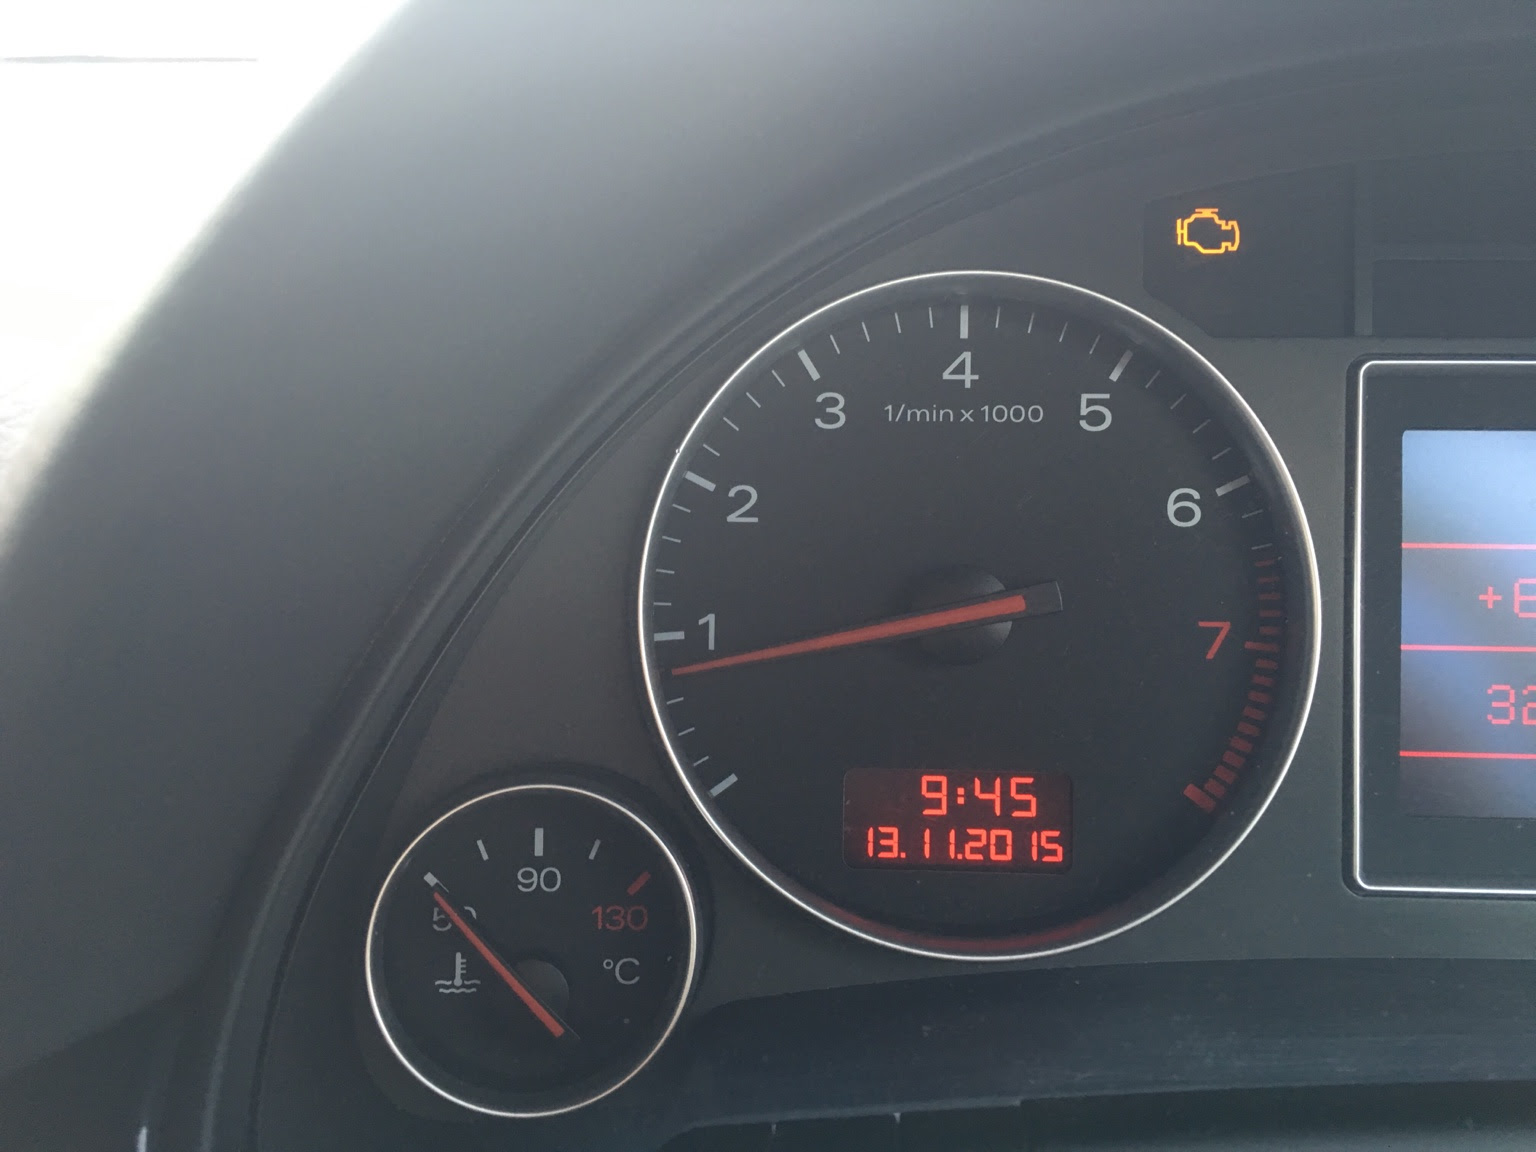 Audi A4 20 Tdi Engine Management Light